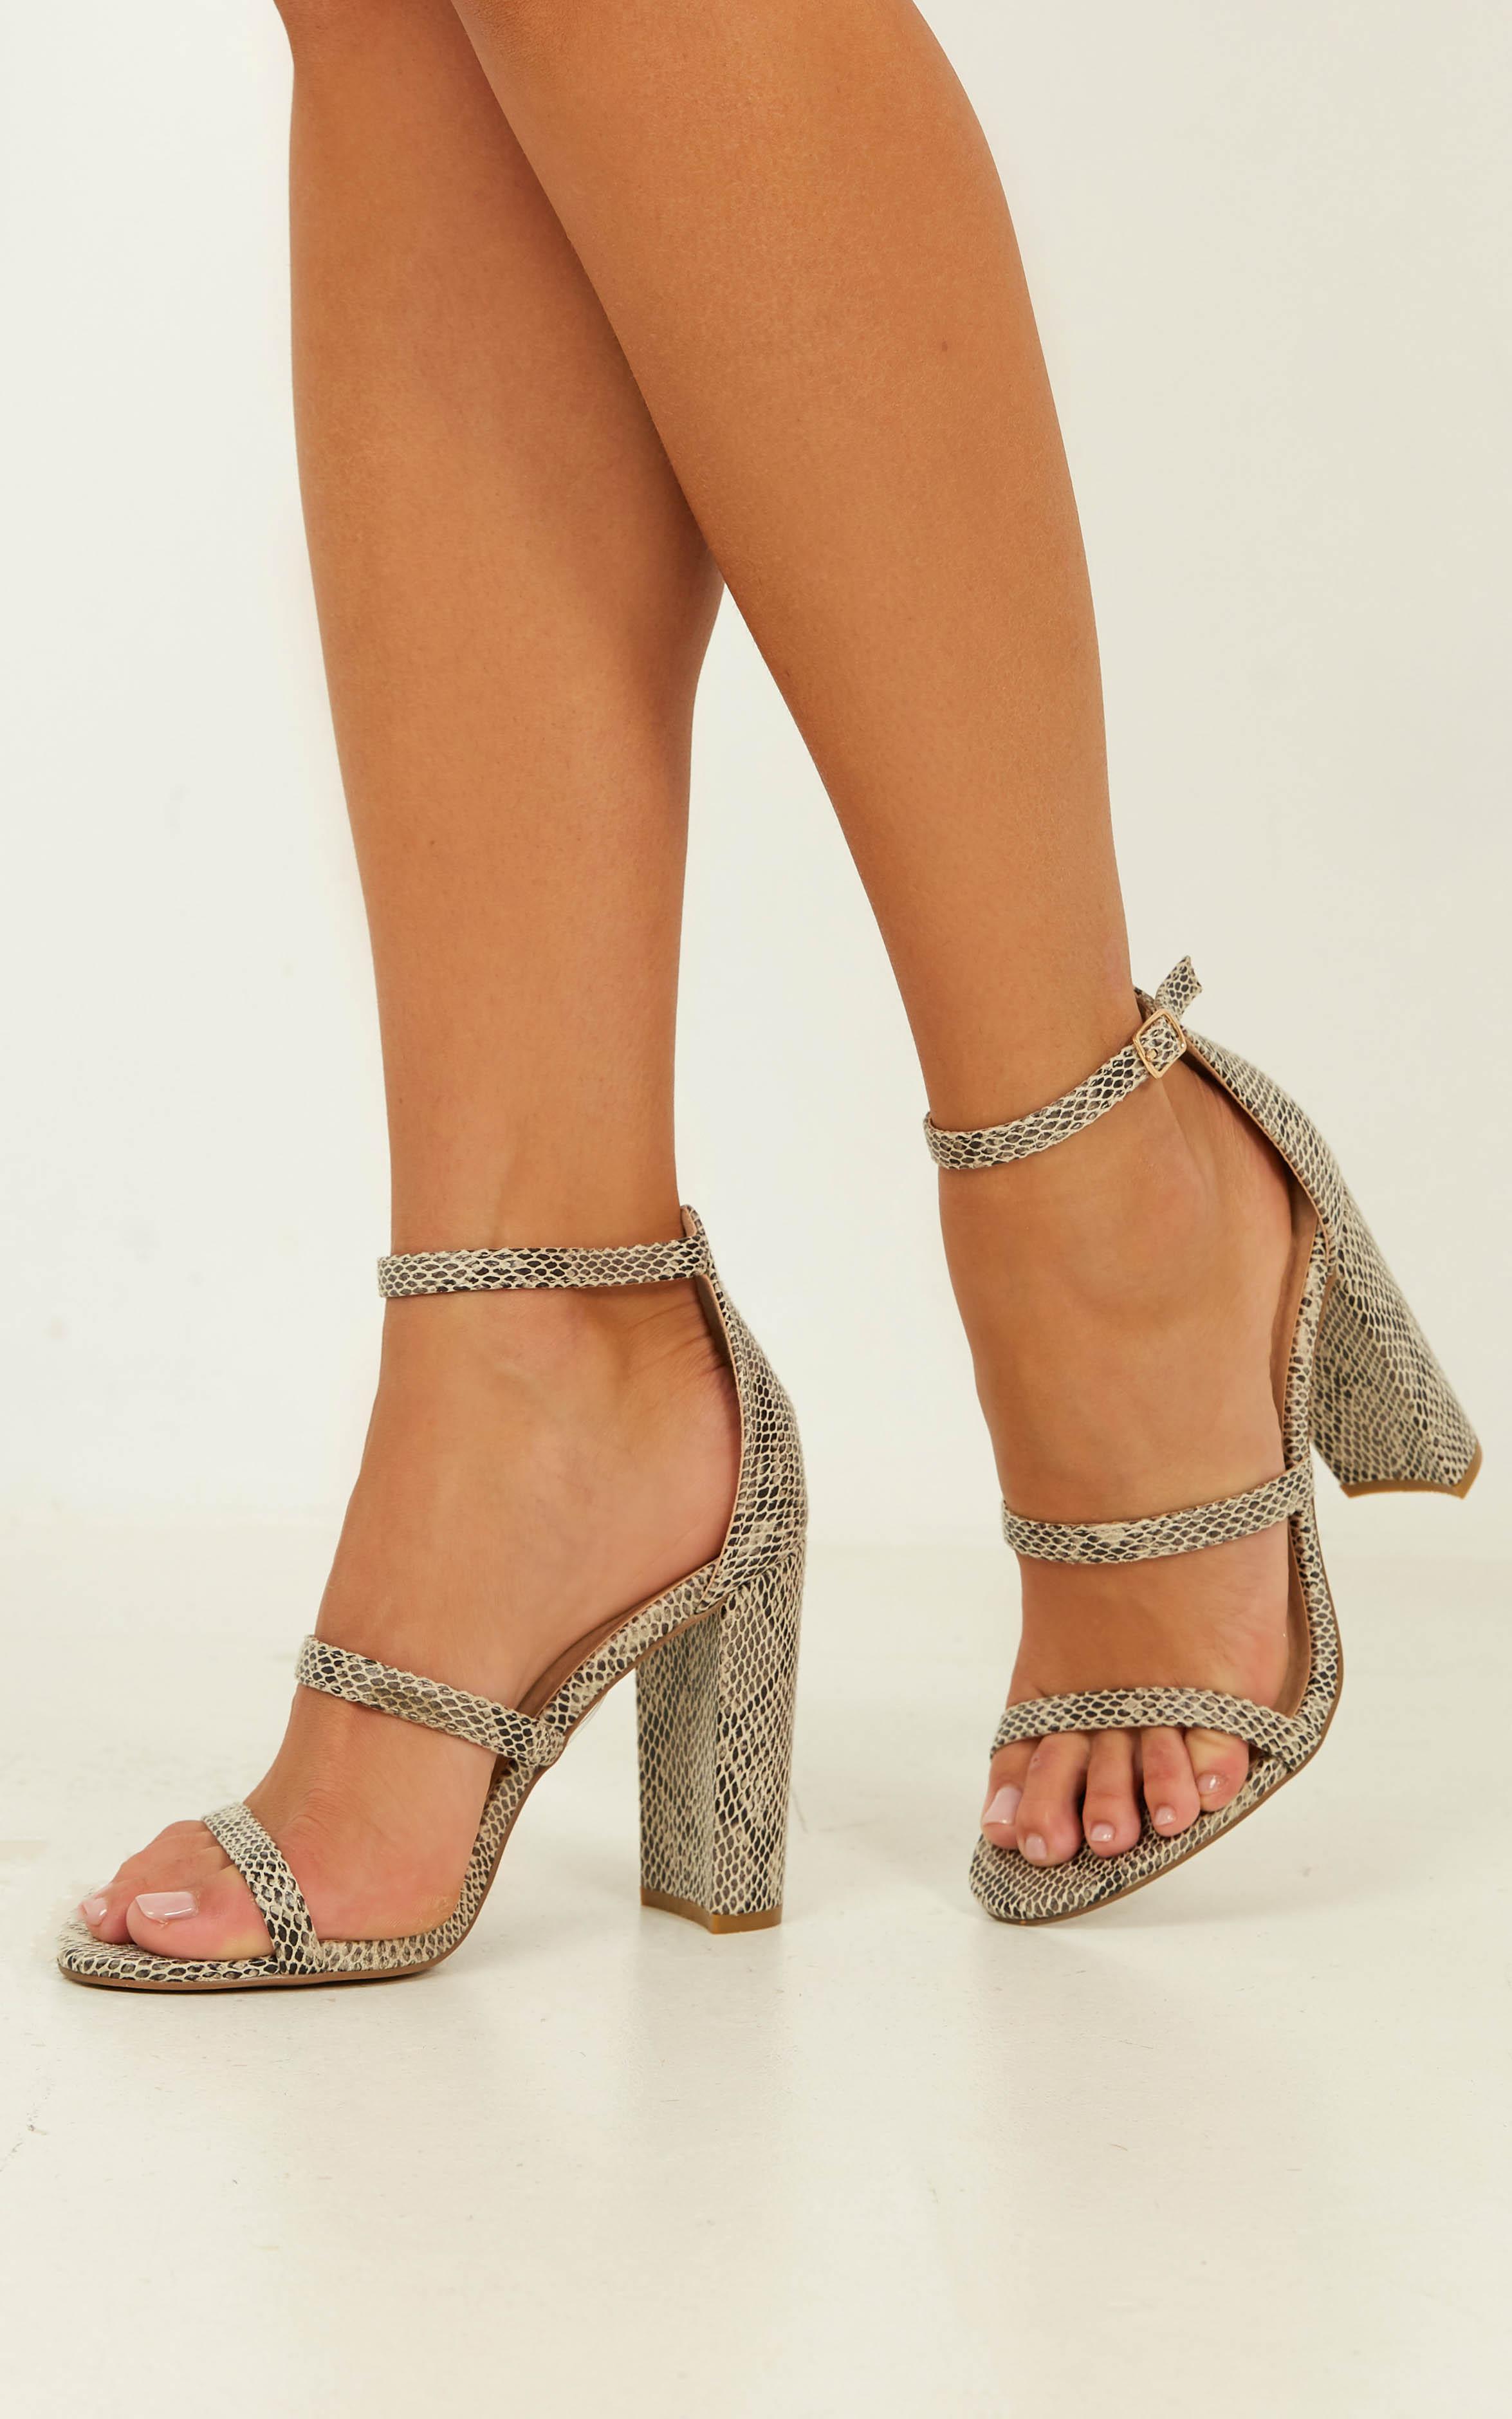 Billini - Jatari heels in beige reptile - 9, Beige, hi-res image number null